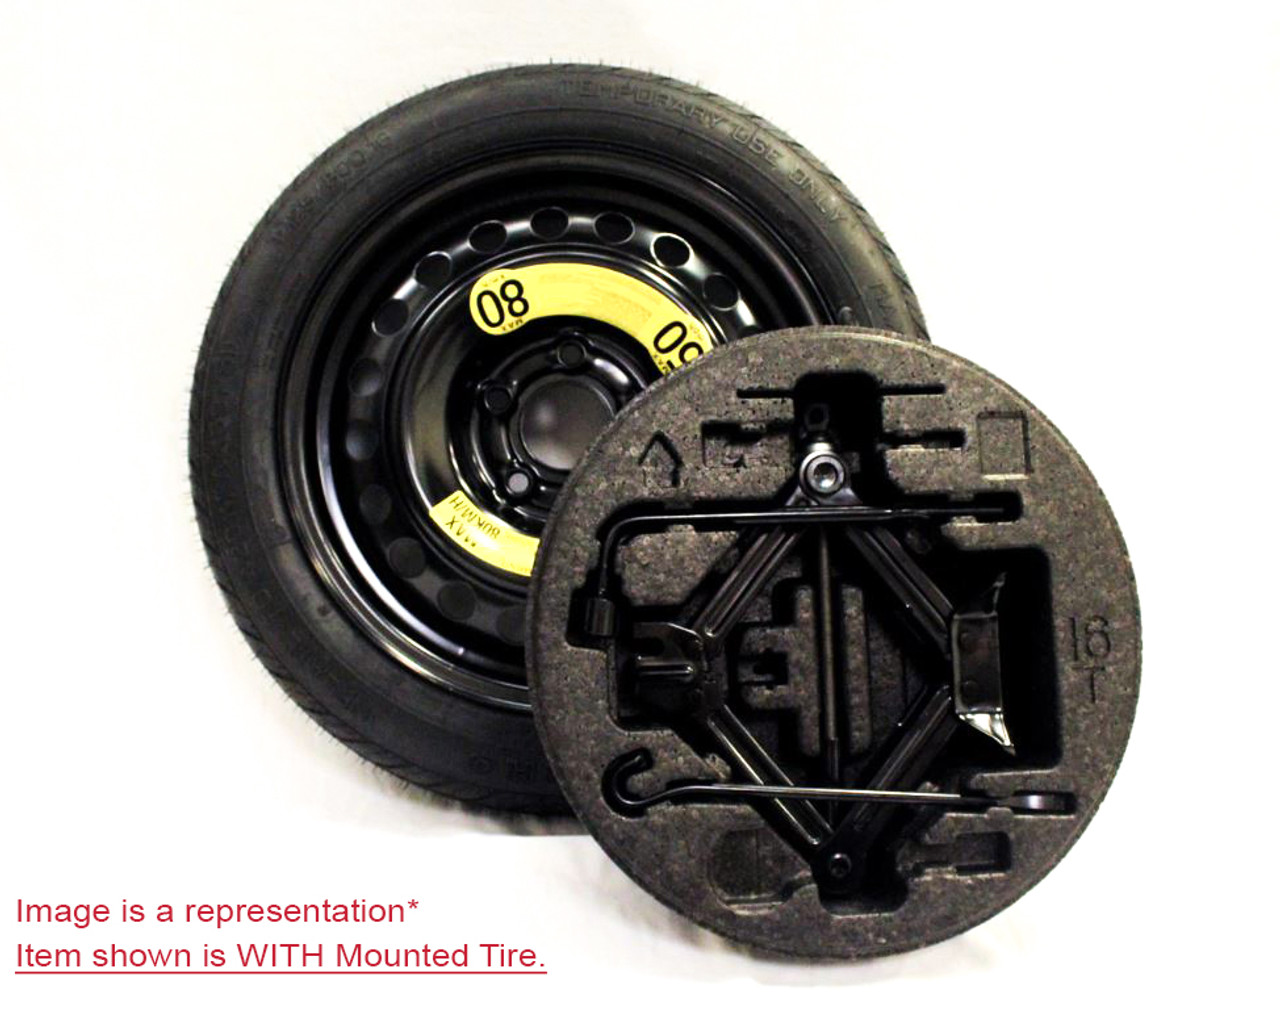 Weathertech Car Mats >> 2017-2019 Kia Soul Spare Tire Kit - Free Shipping | Kia Stuff